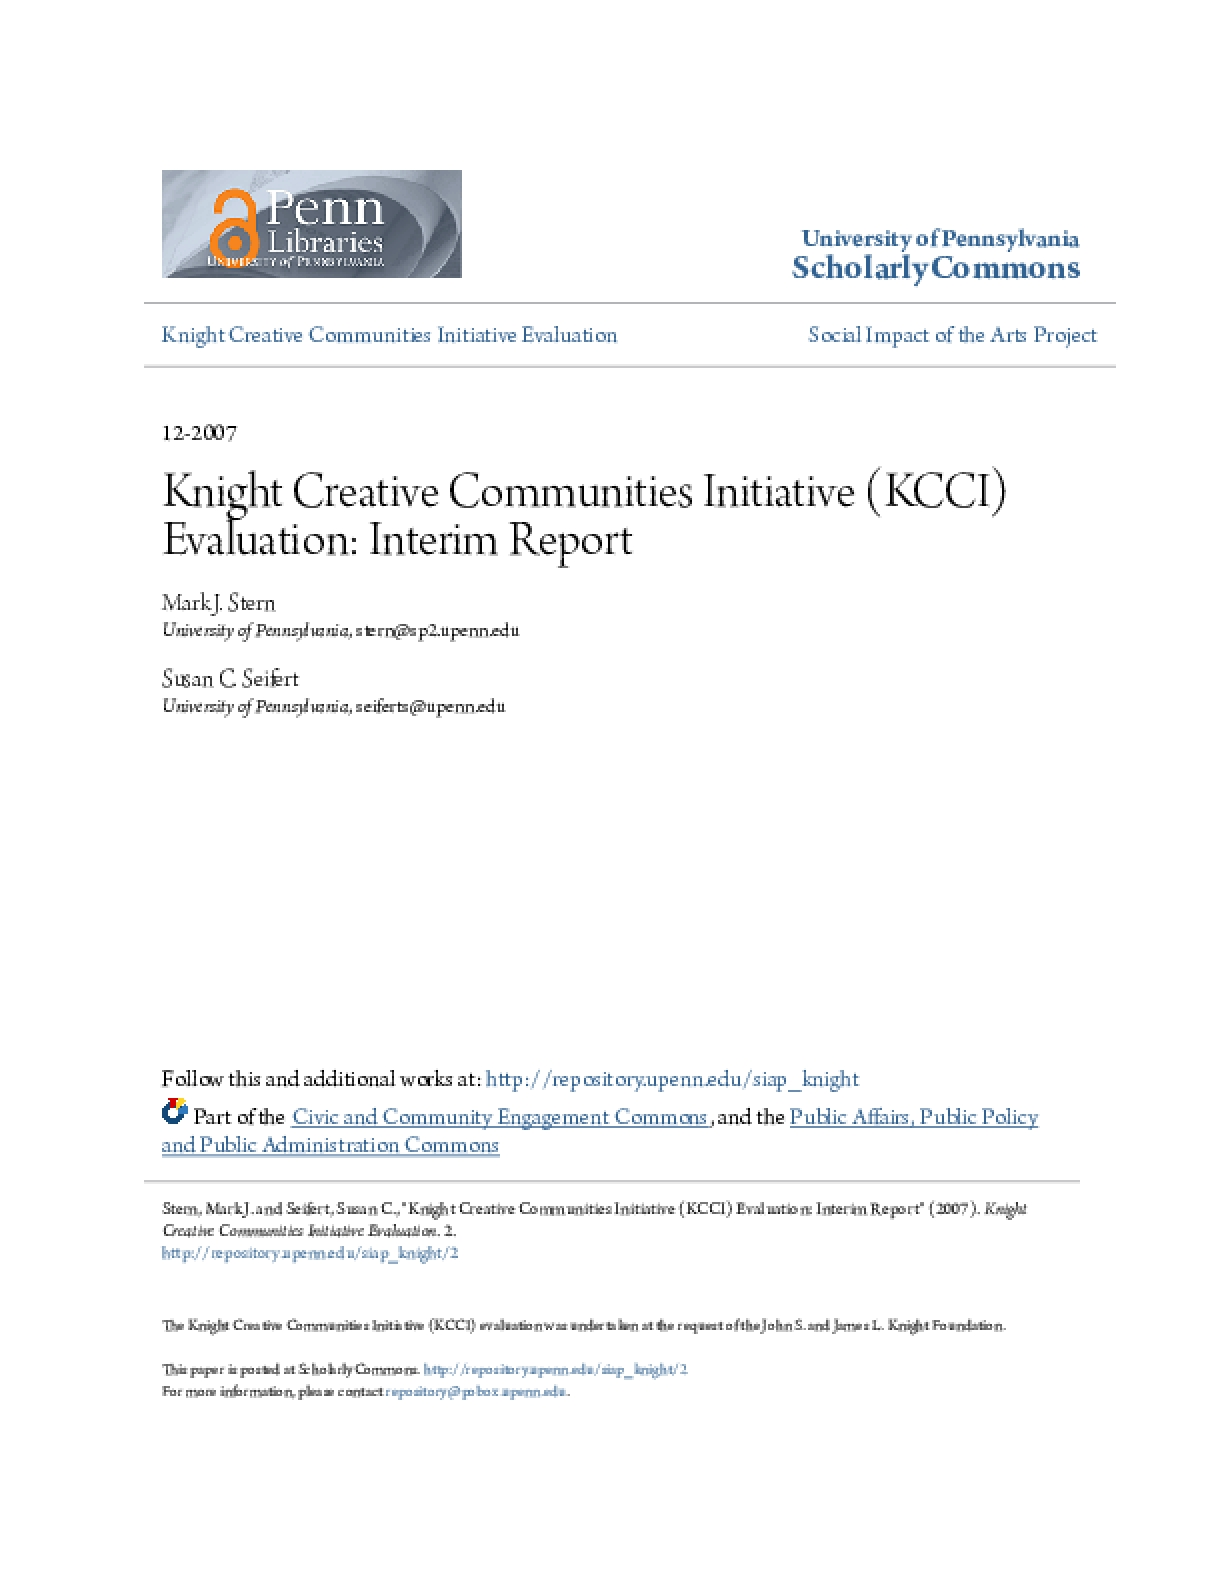 Knight Creative Communities Initiative (KCCI) Evaluation: Interim Report